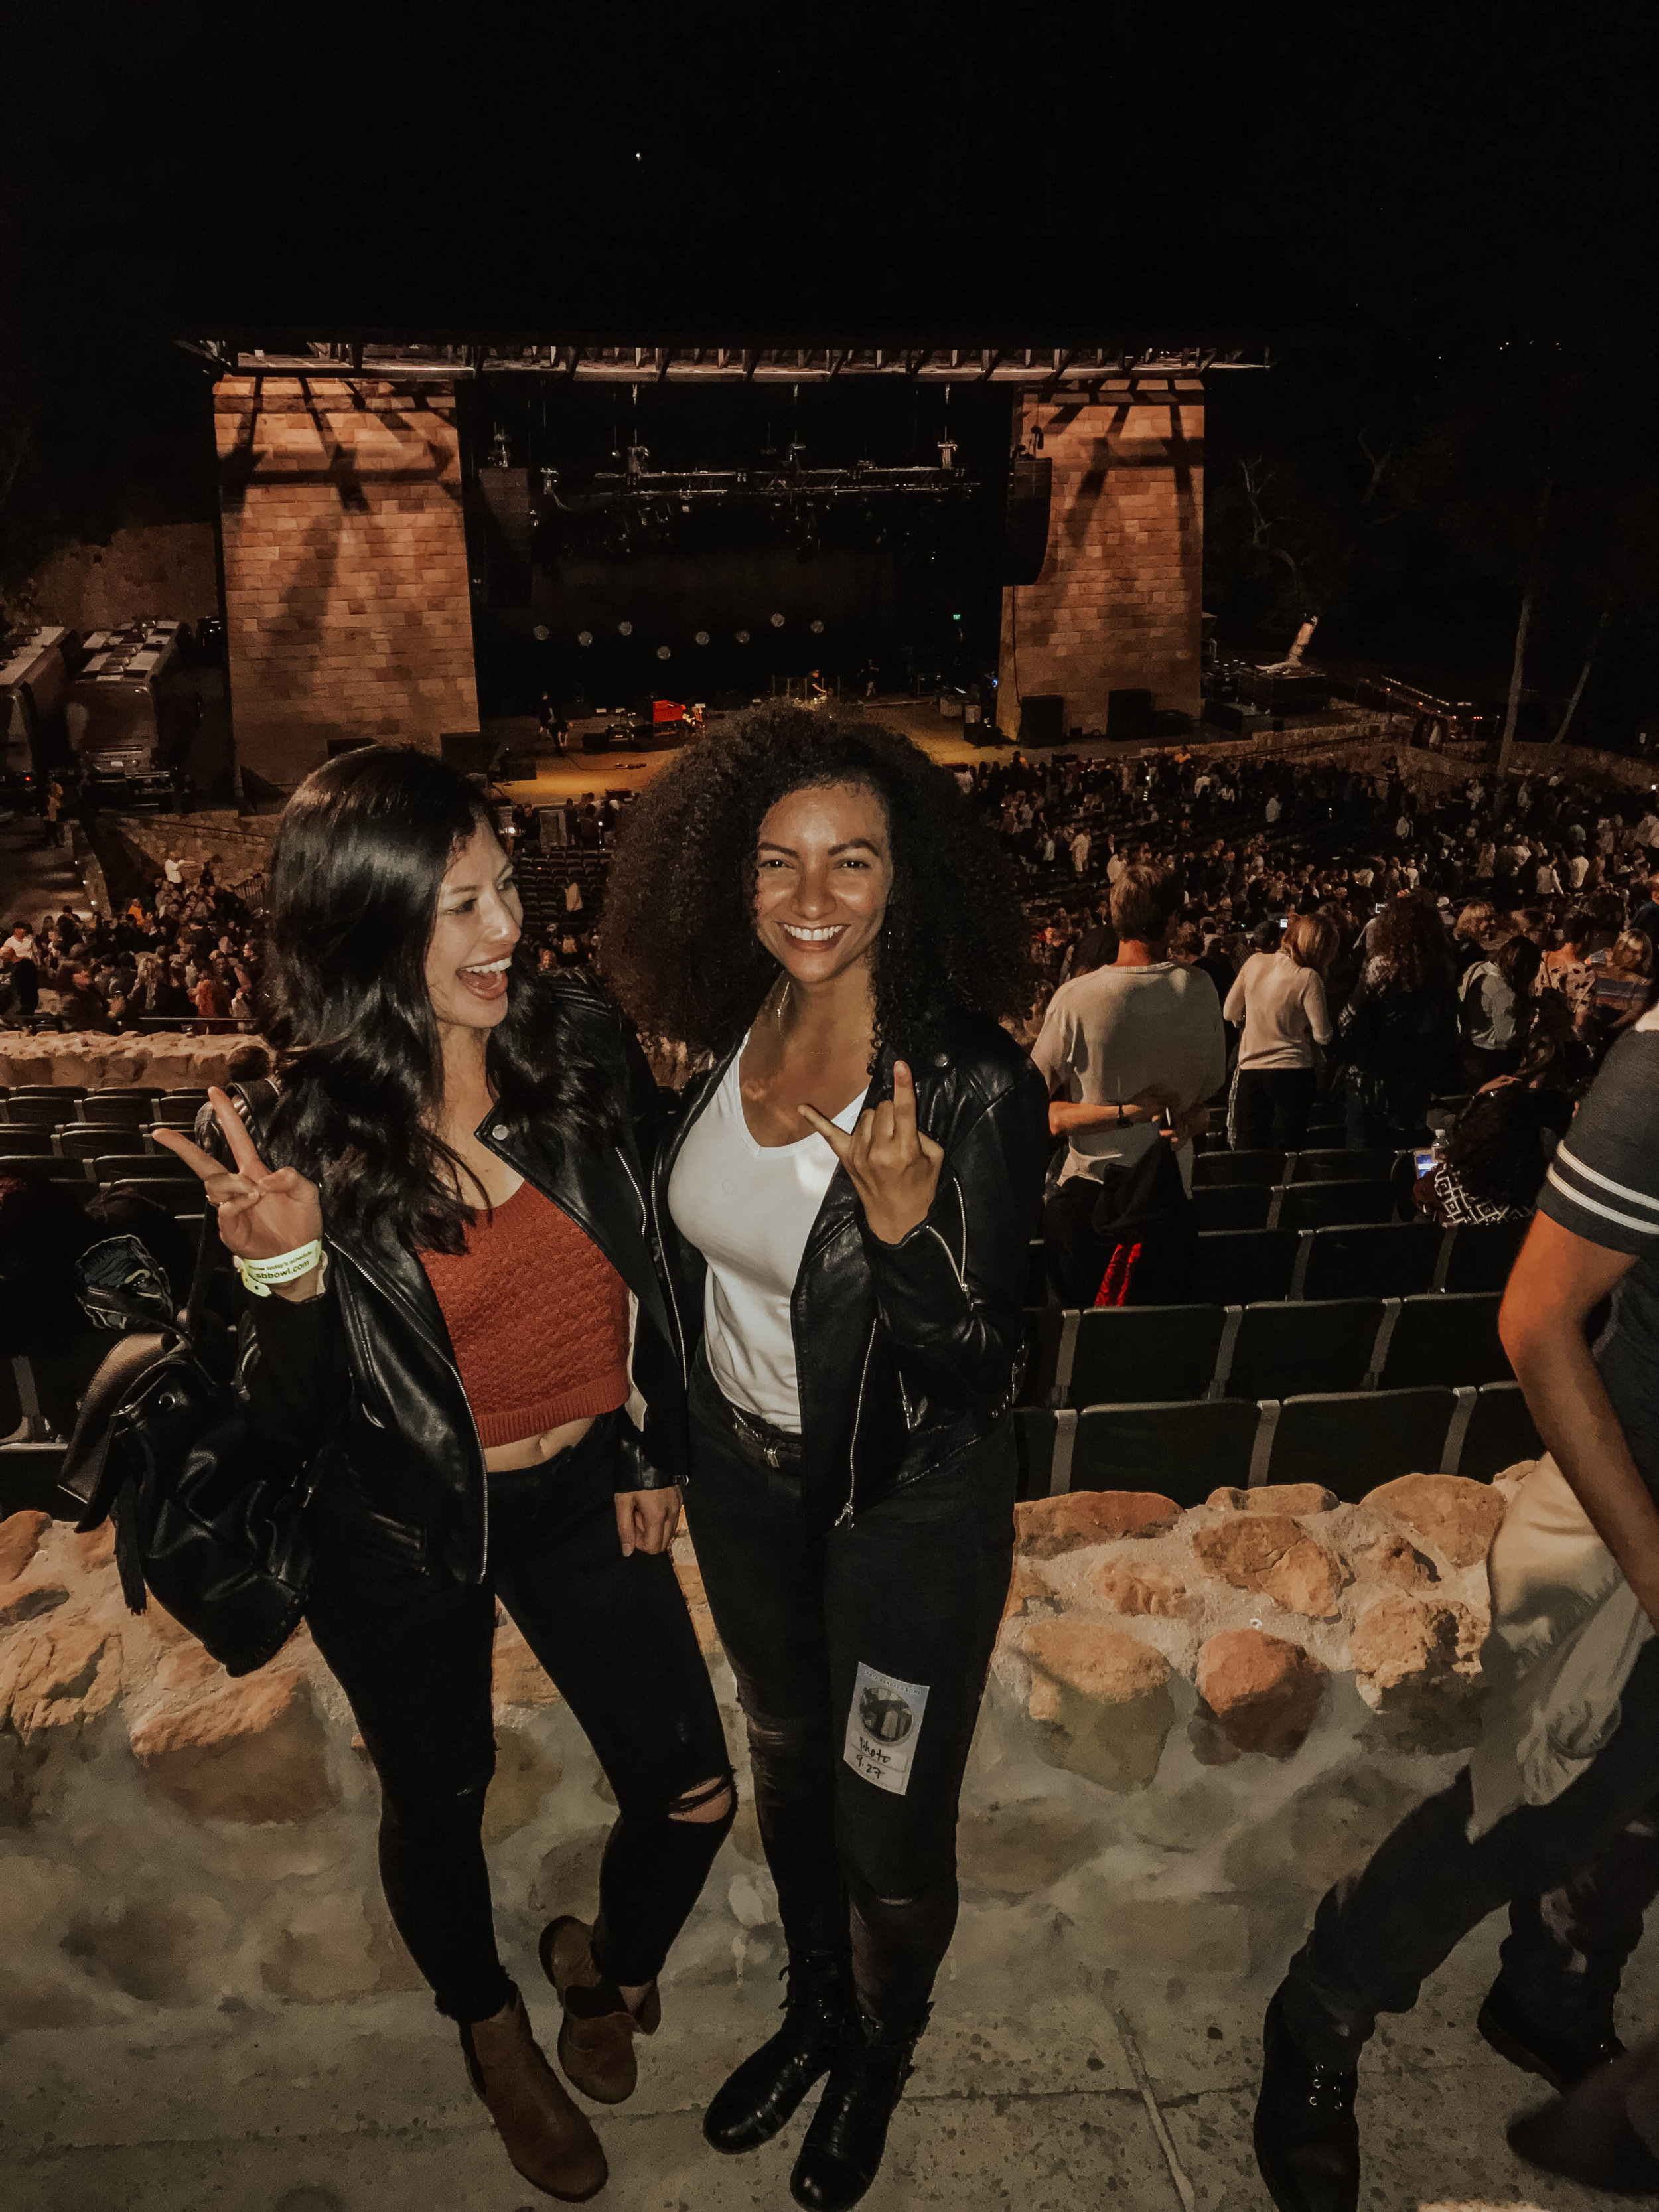 With friend Samantha Johnson post Alanis Morissette concert, Santa Barbara Bowl